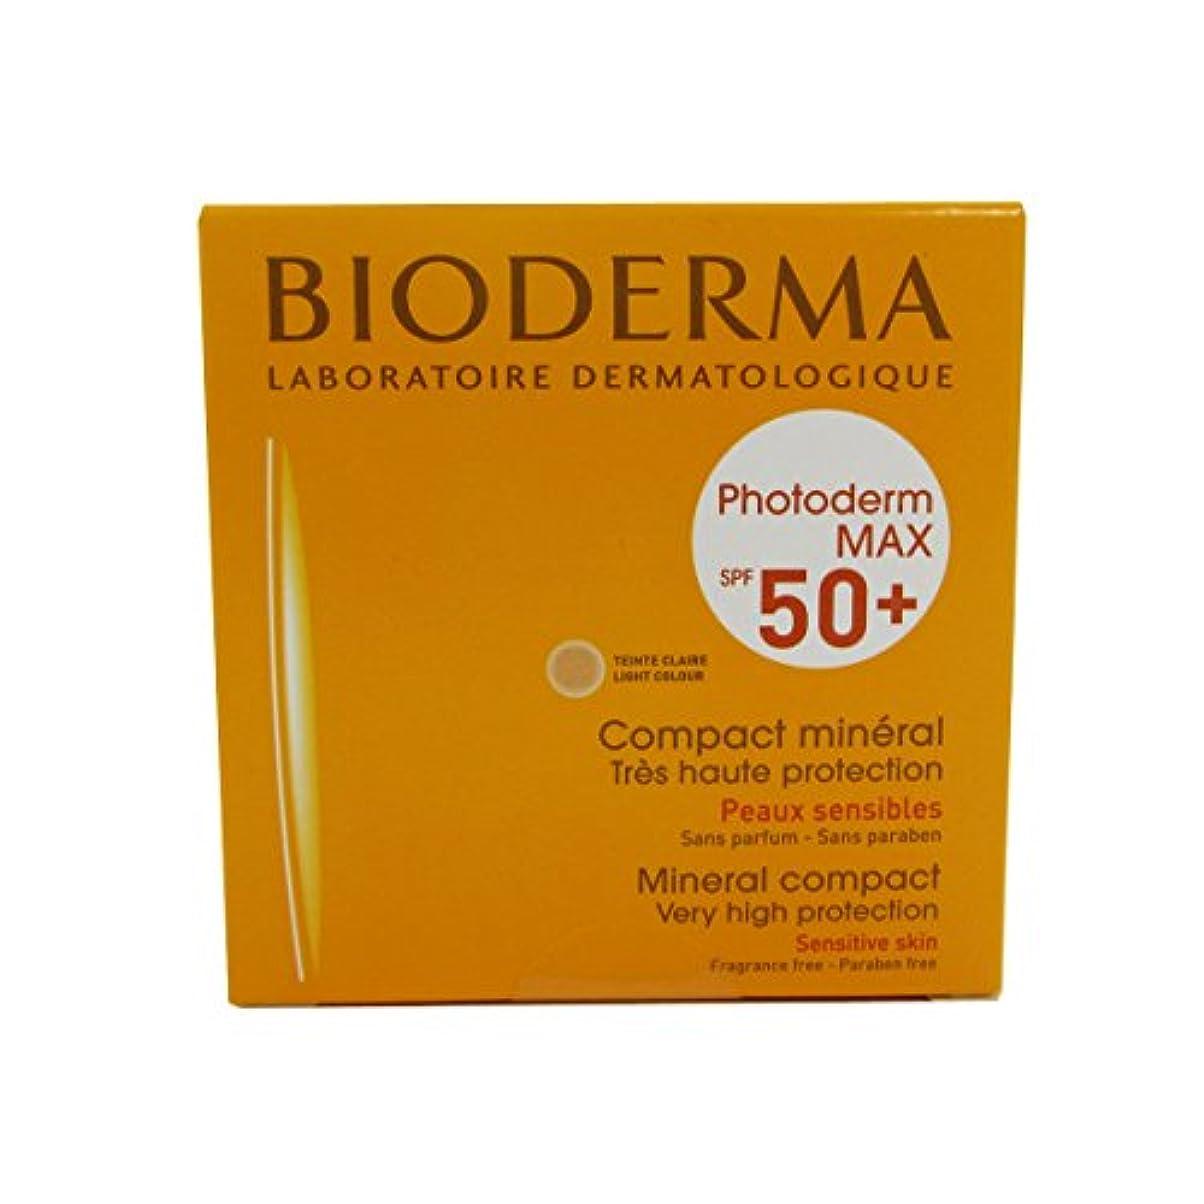 個性店員家畜Bioderma Photoderm Max Compact Mineral 50+ Light 10g [並行輸入品]